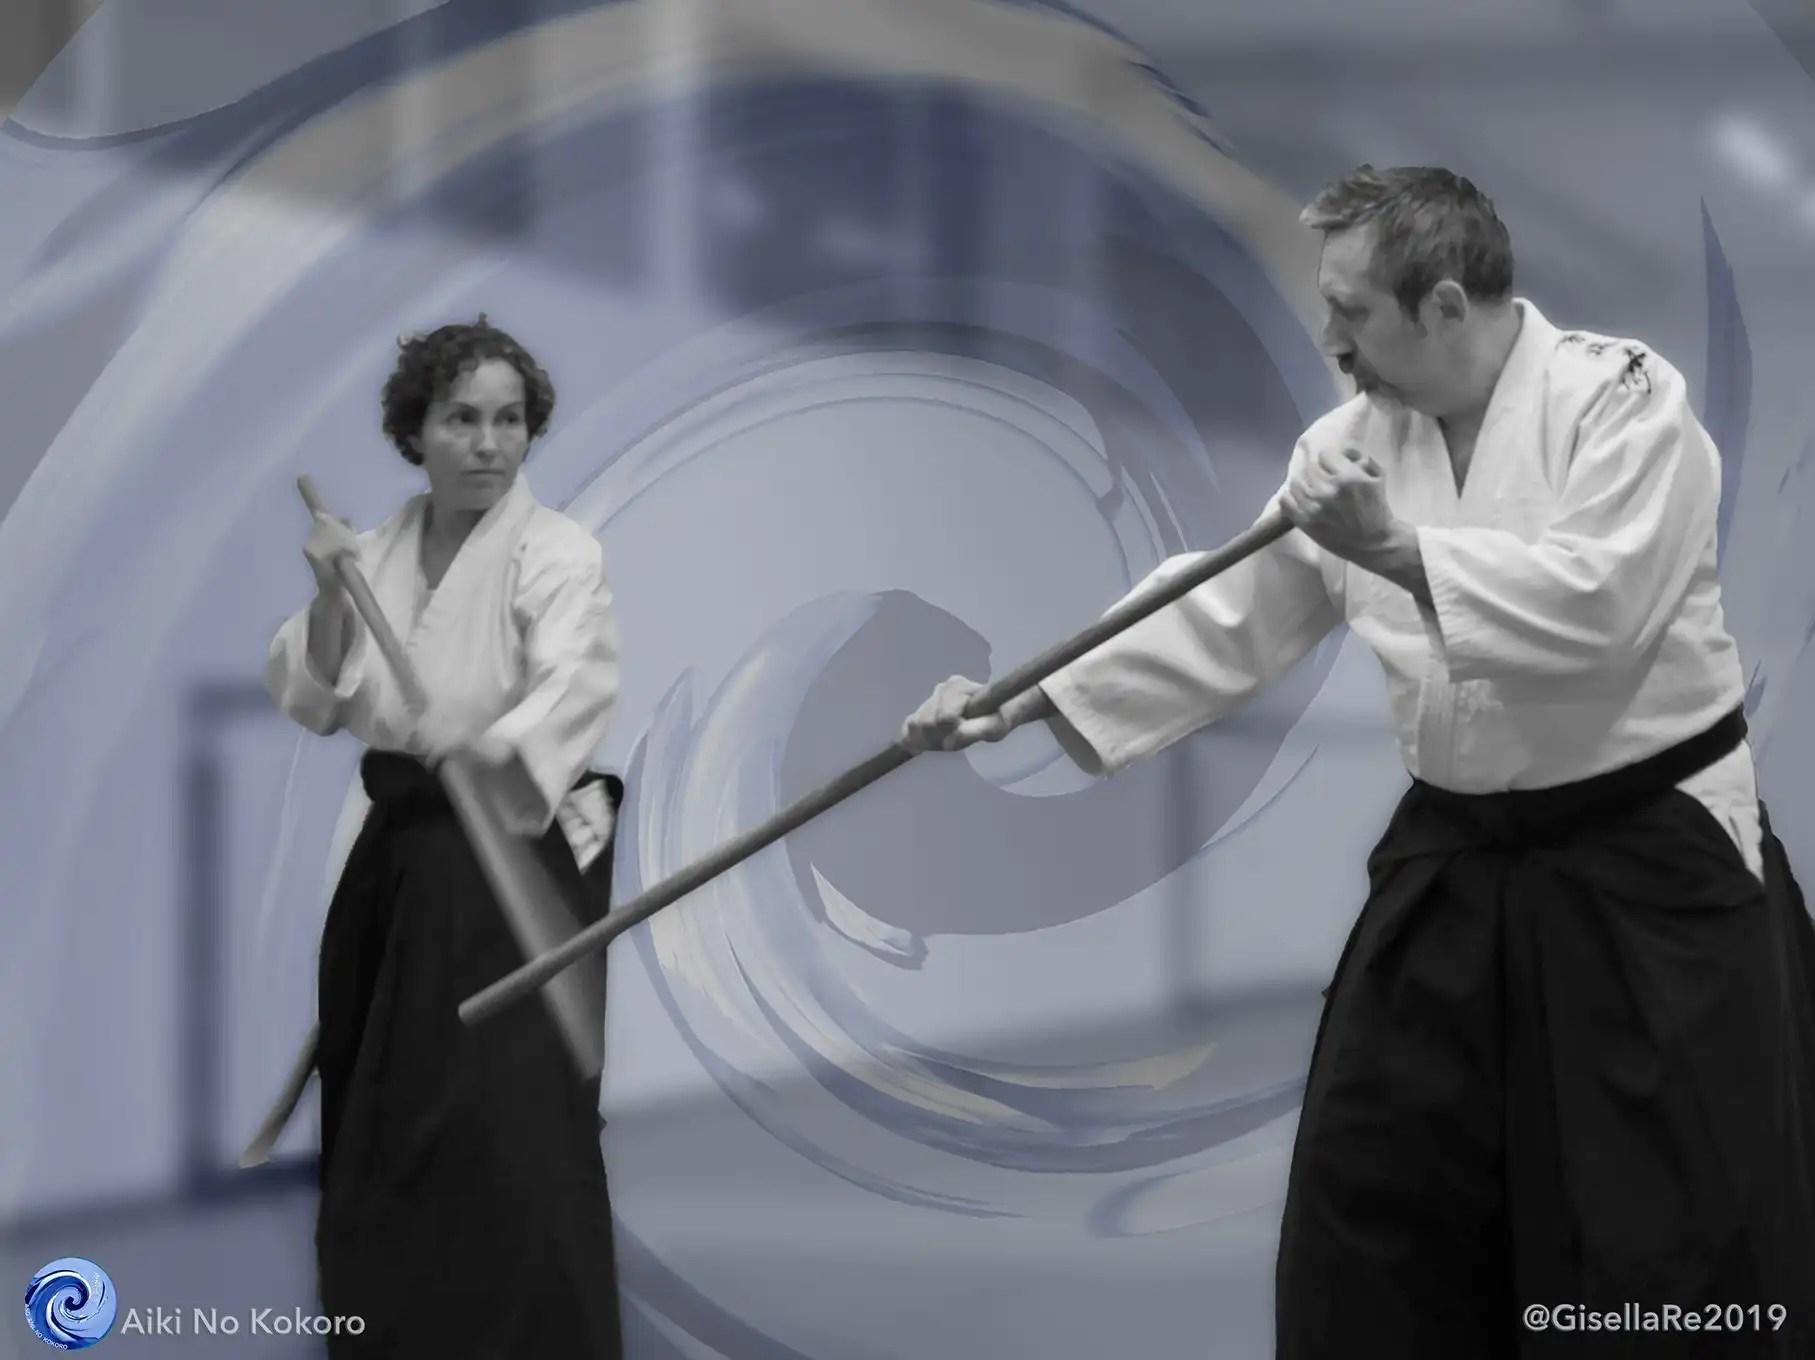 Aiki No Kokoro Boves, Scuola di Aikido Cuneo, Aikido Bukiwaza